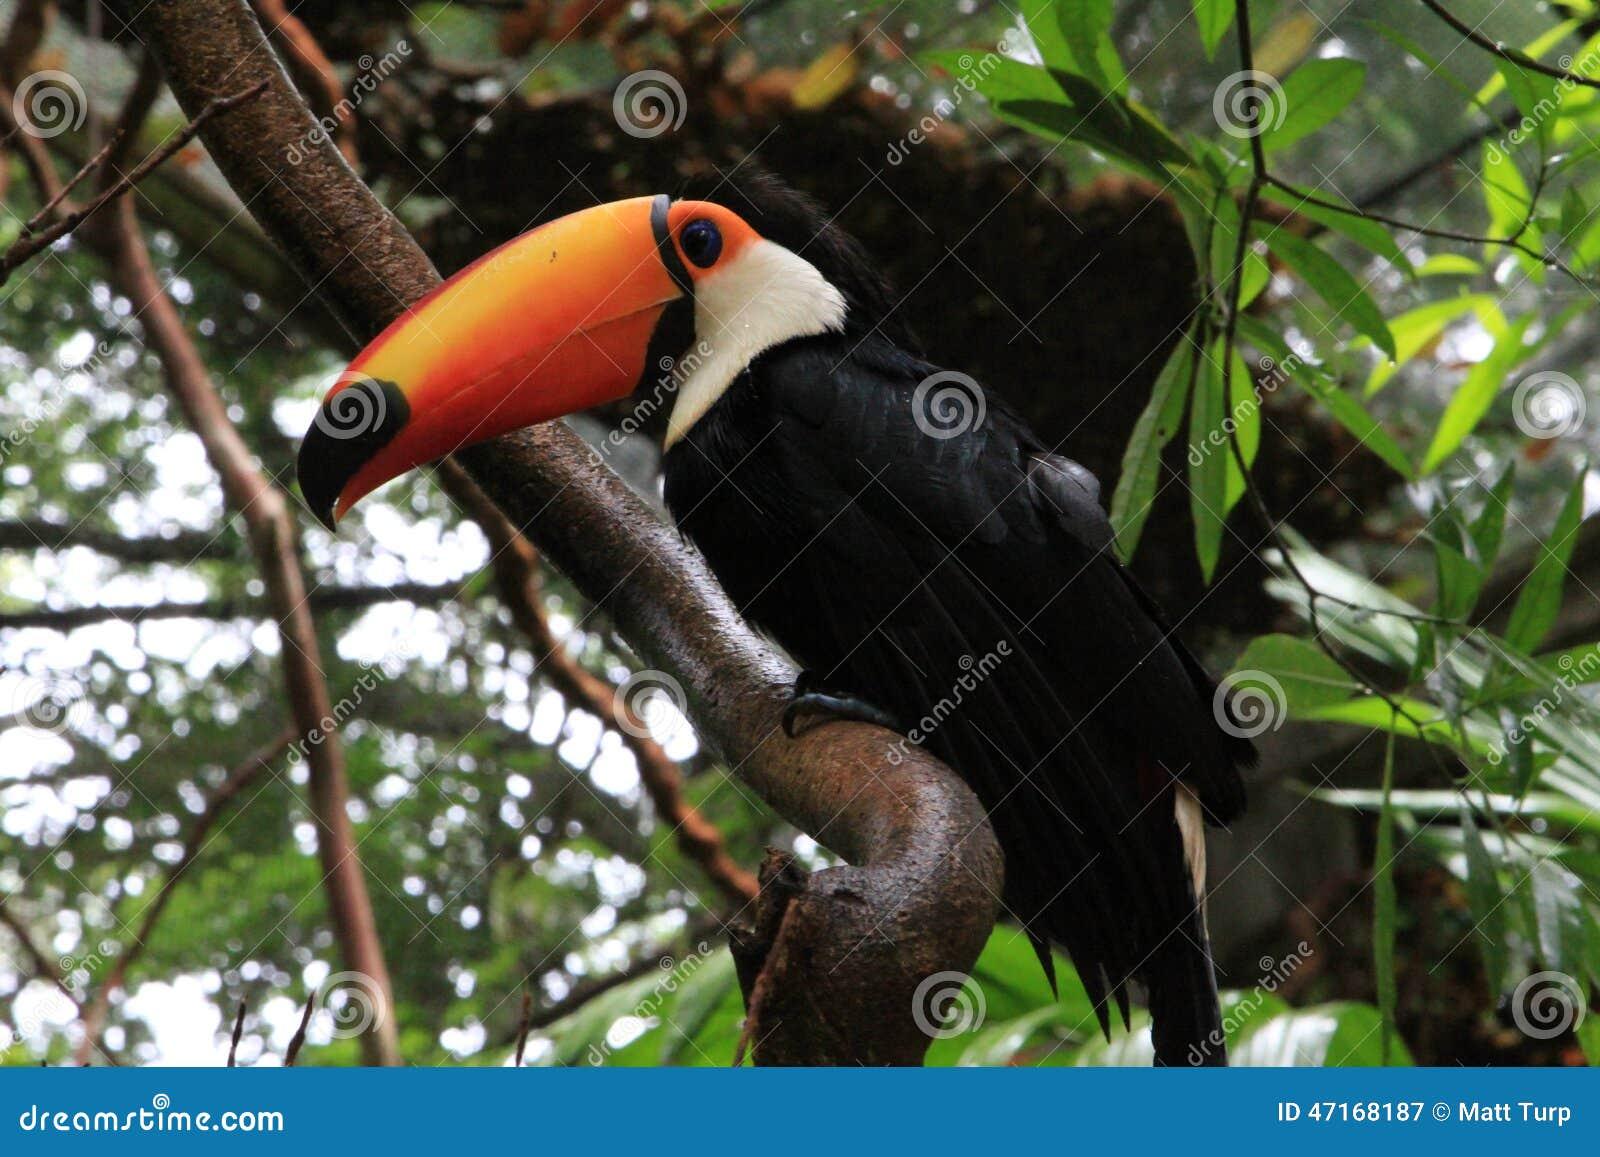 Toucan in the Amazon Jungle